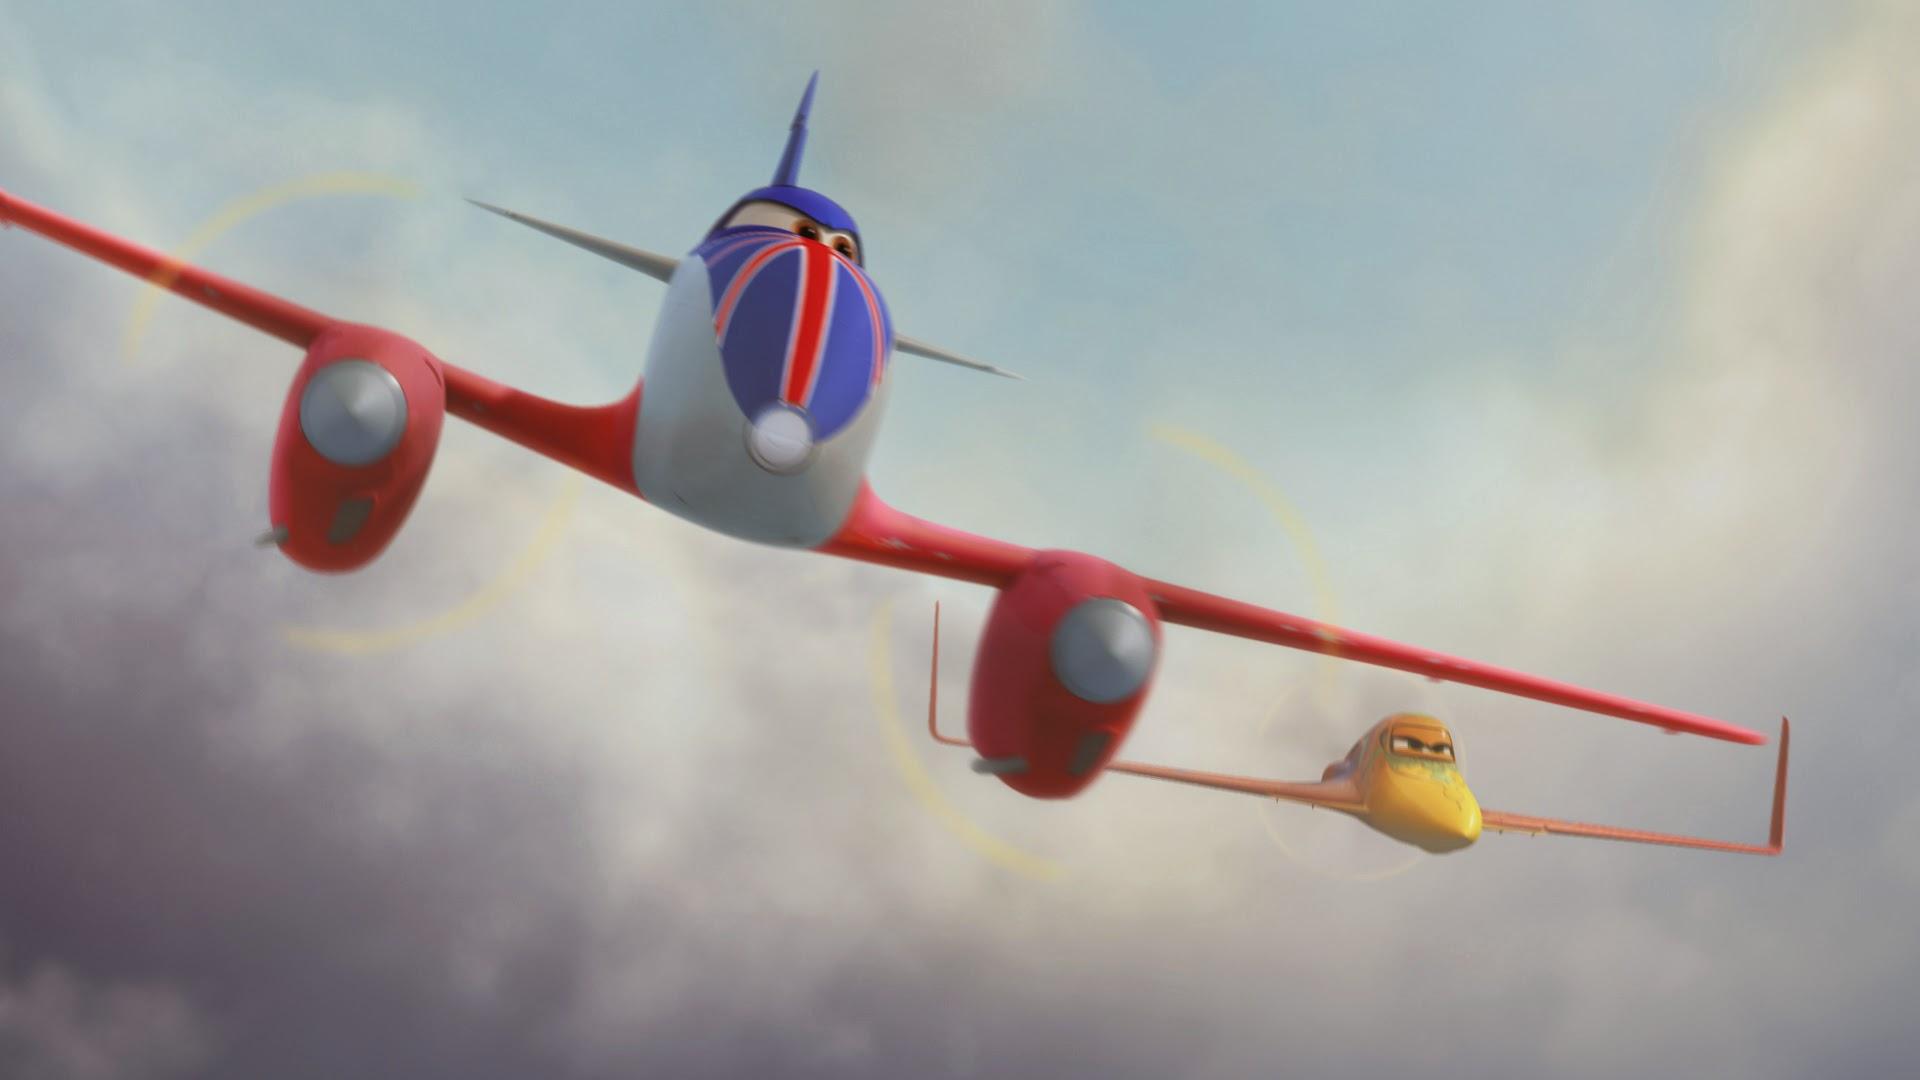 disney planes movie wallpapers - photo #31